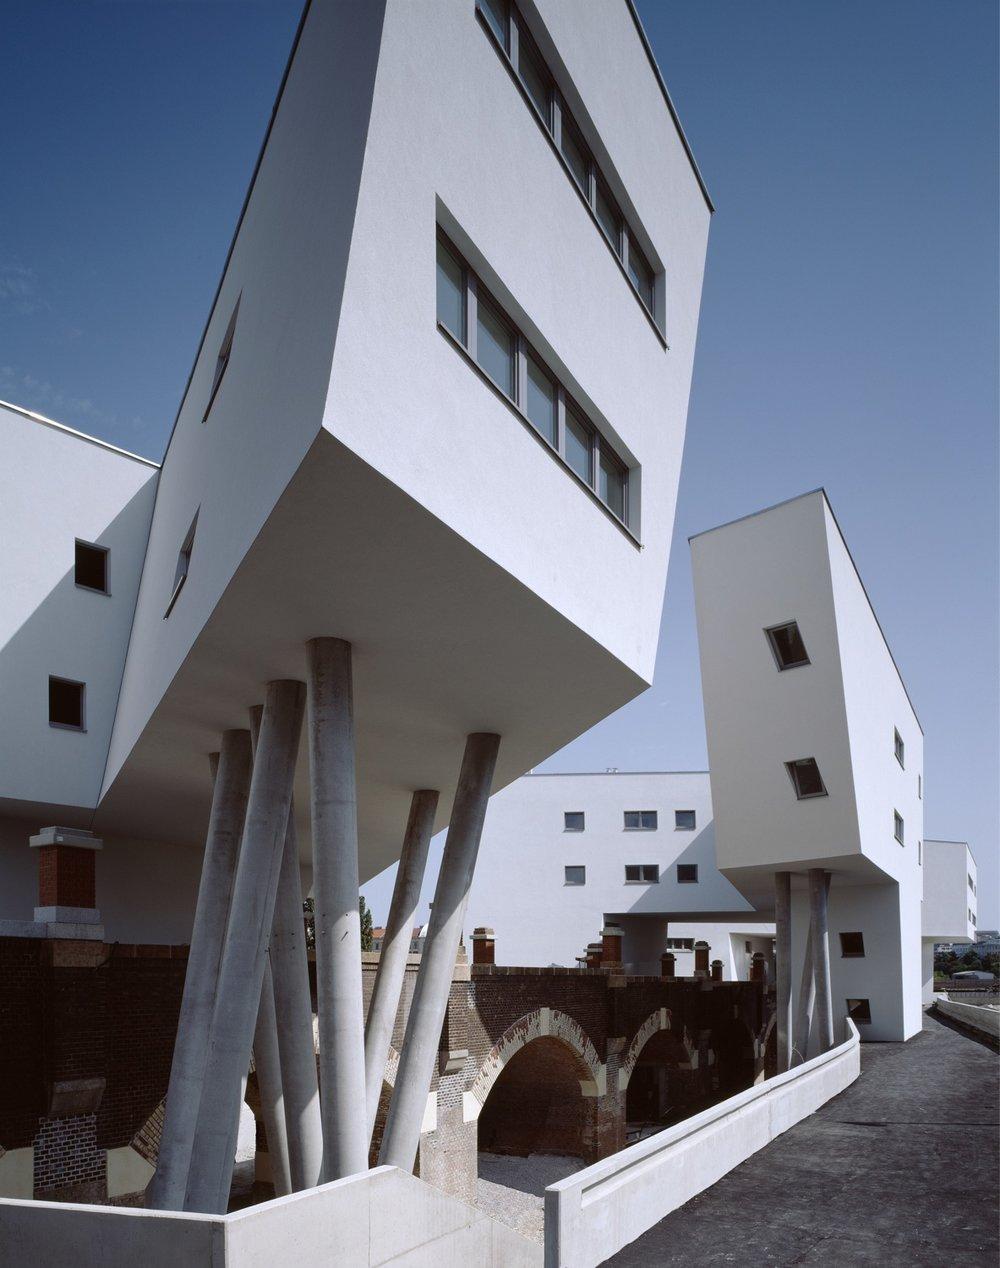 Spittelau Viaducts Housing by Zaha Hadid Architects Photograph Bruno Klomfar